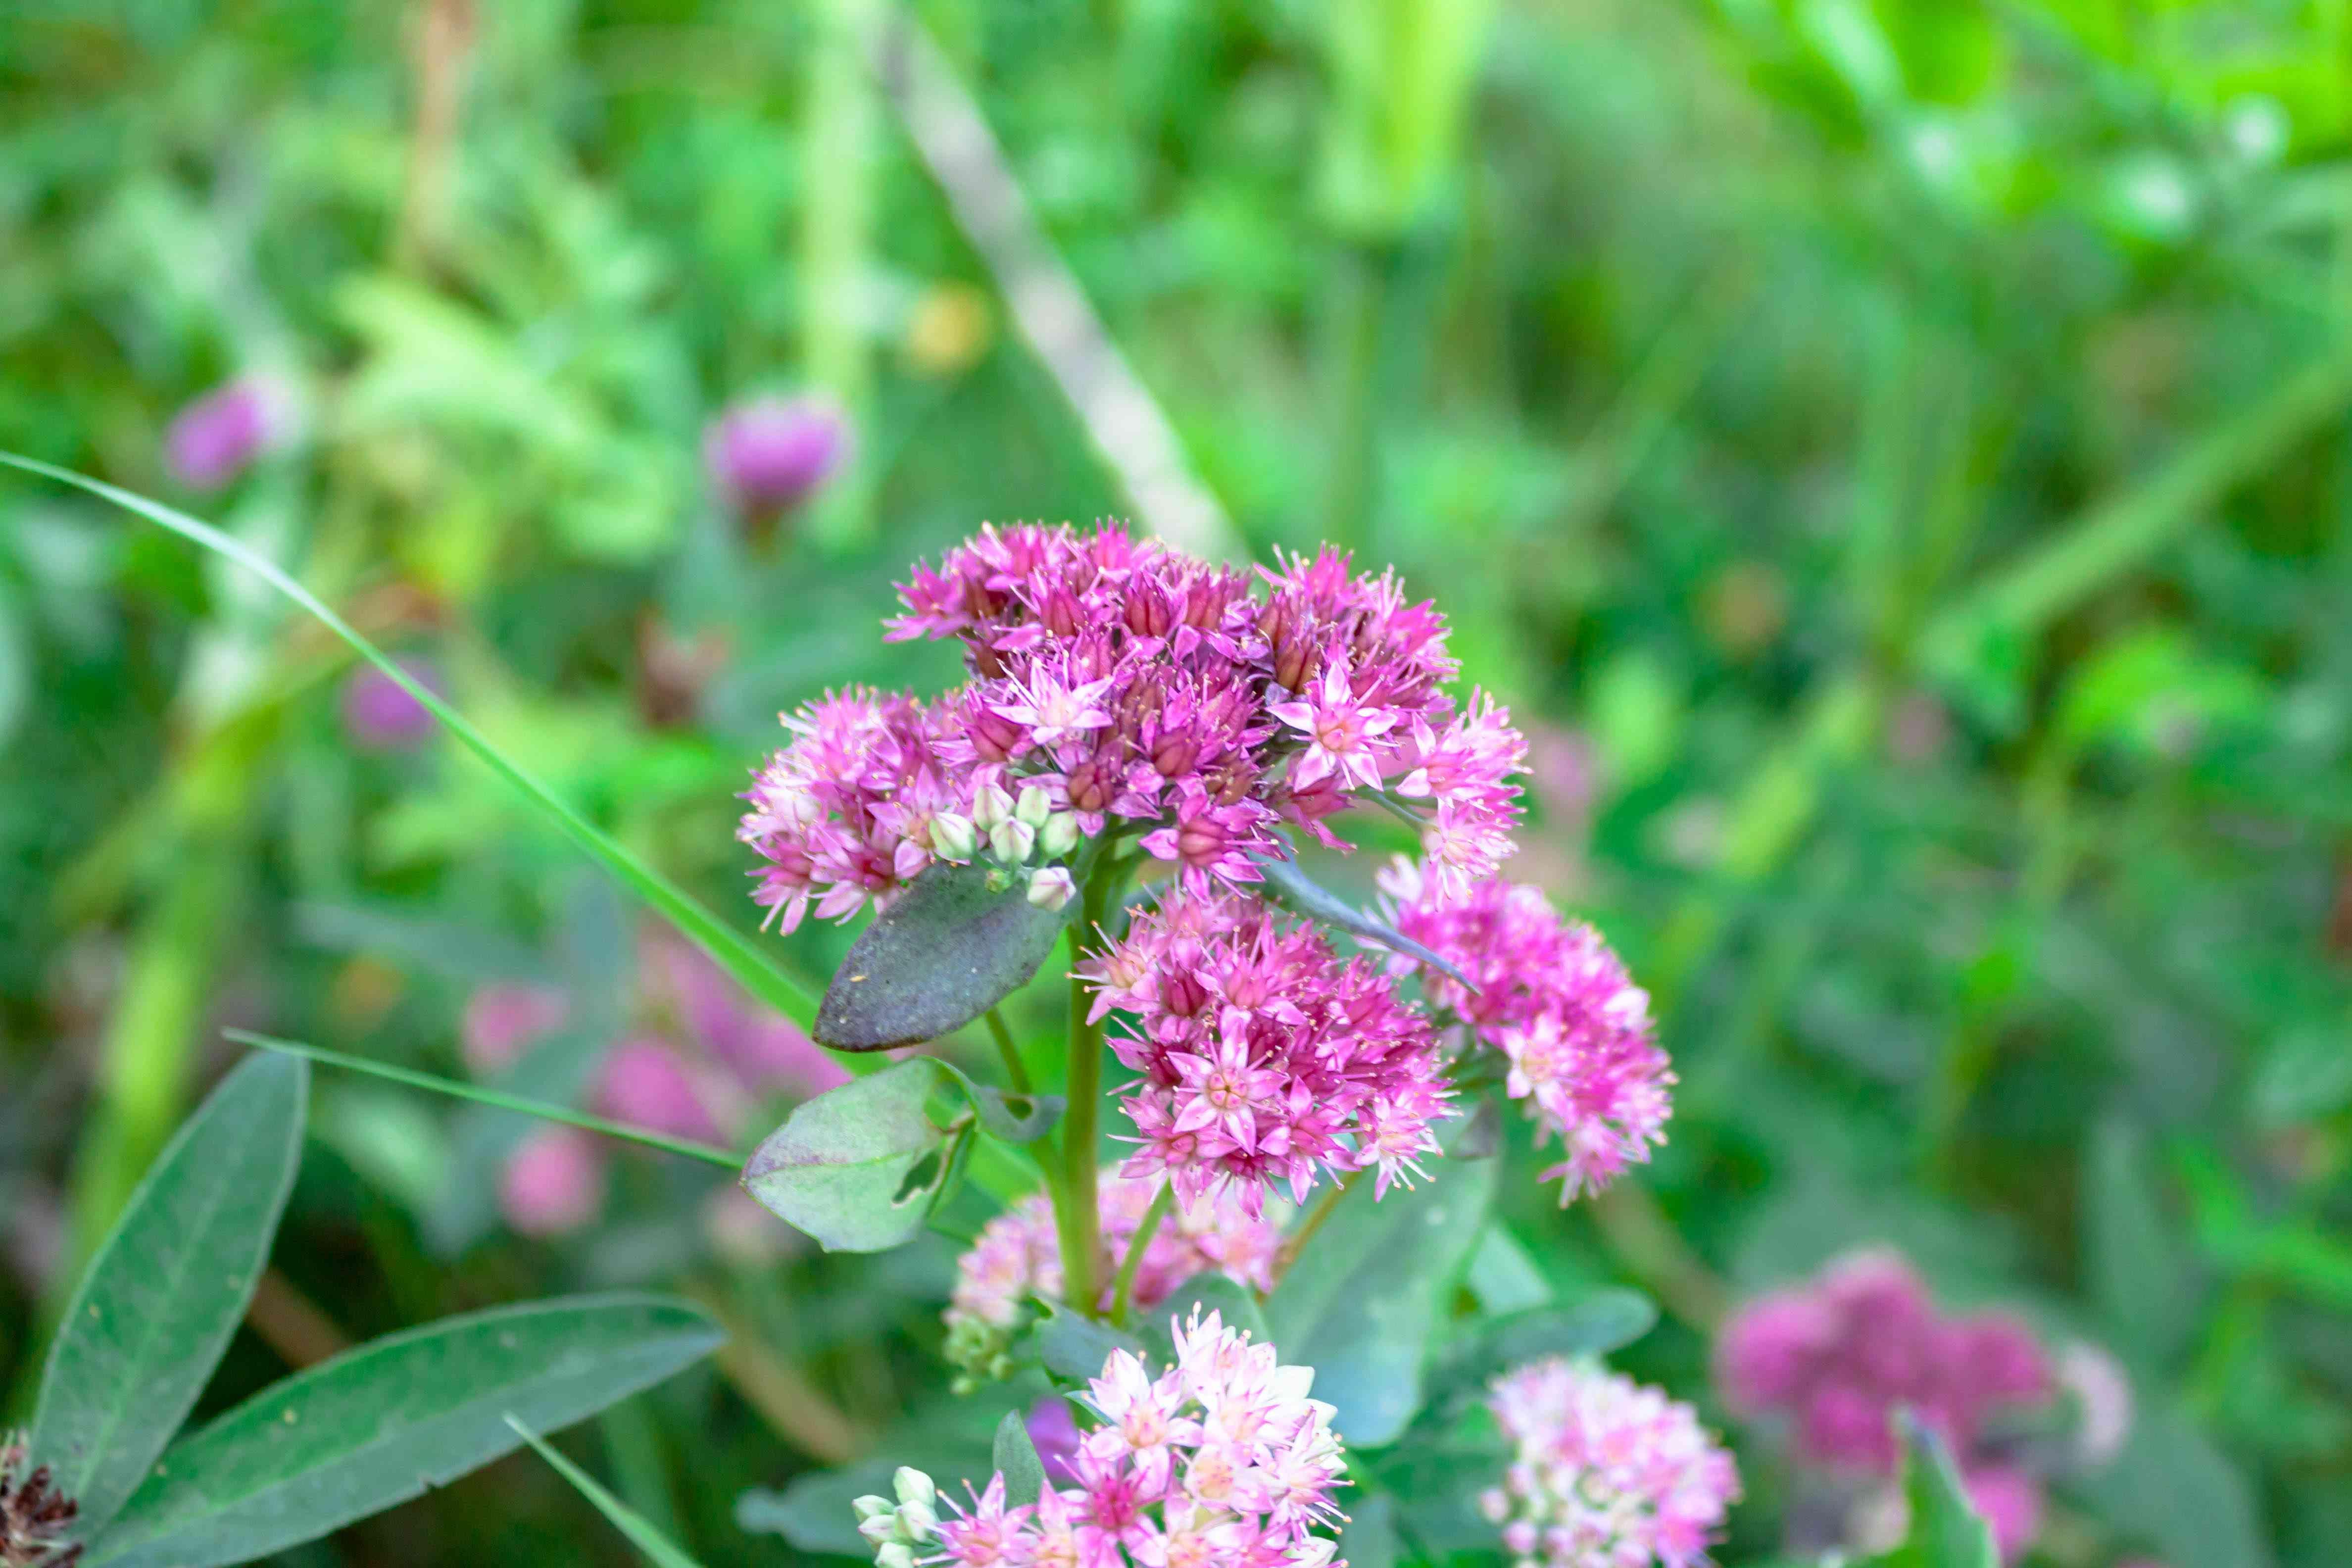 Purple alpine garden plant Hylotelephium triphyllum Sedum Stonecrop close up macro nature background